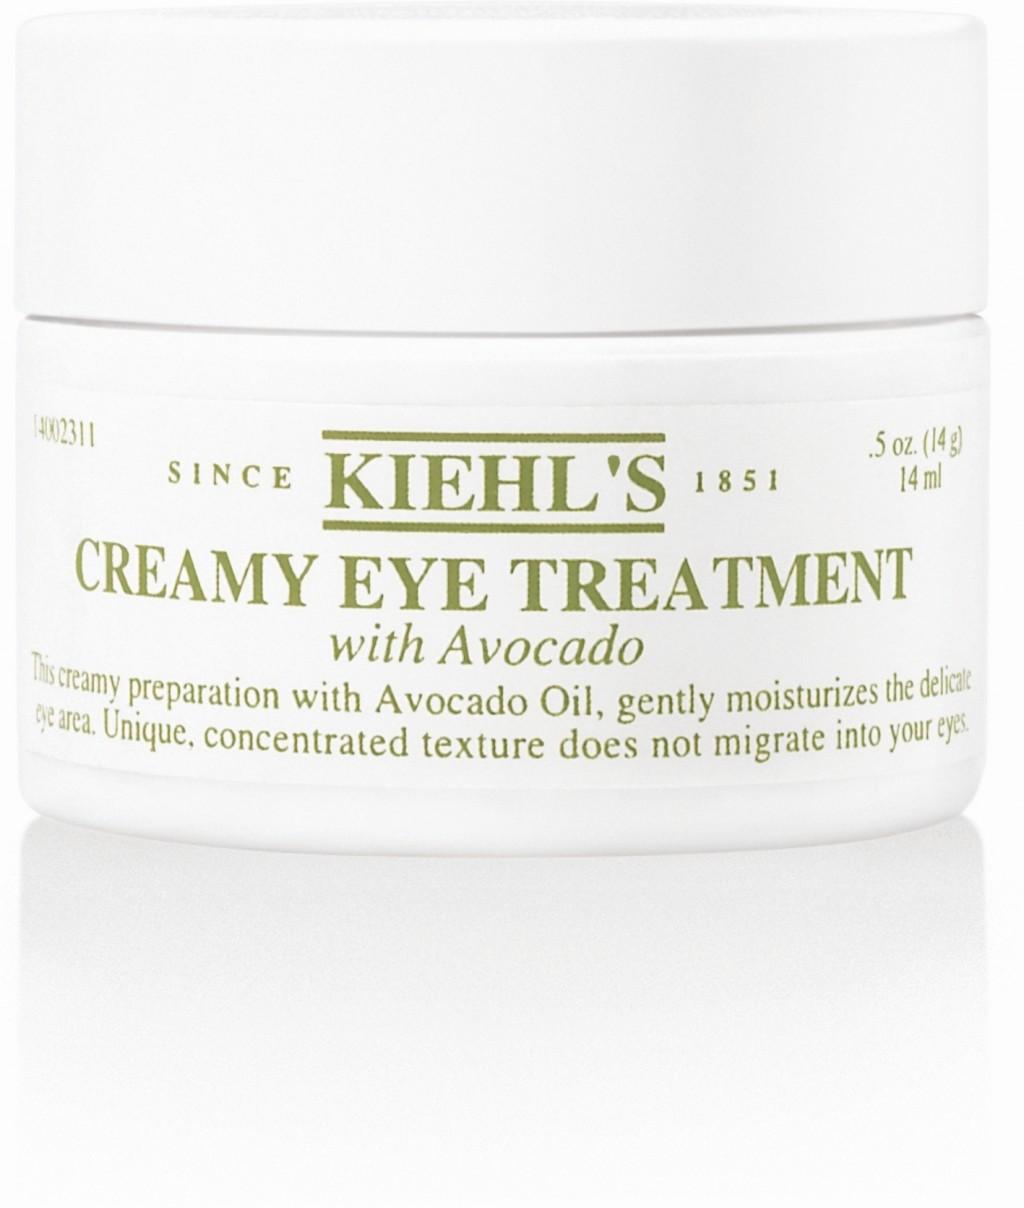 The Eye Cream Kylie Jenner Swears by